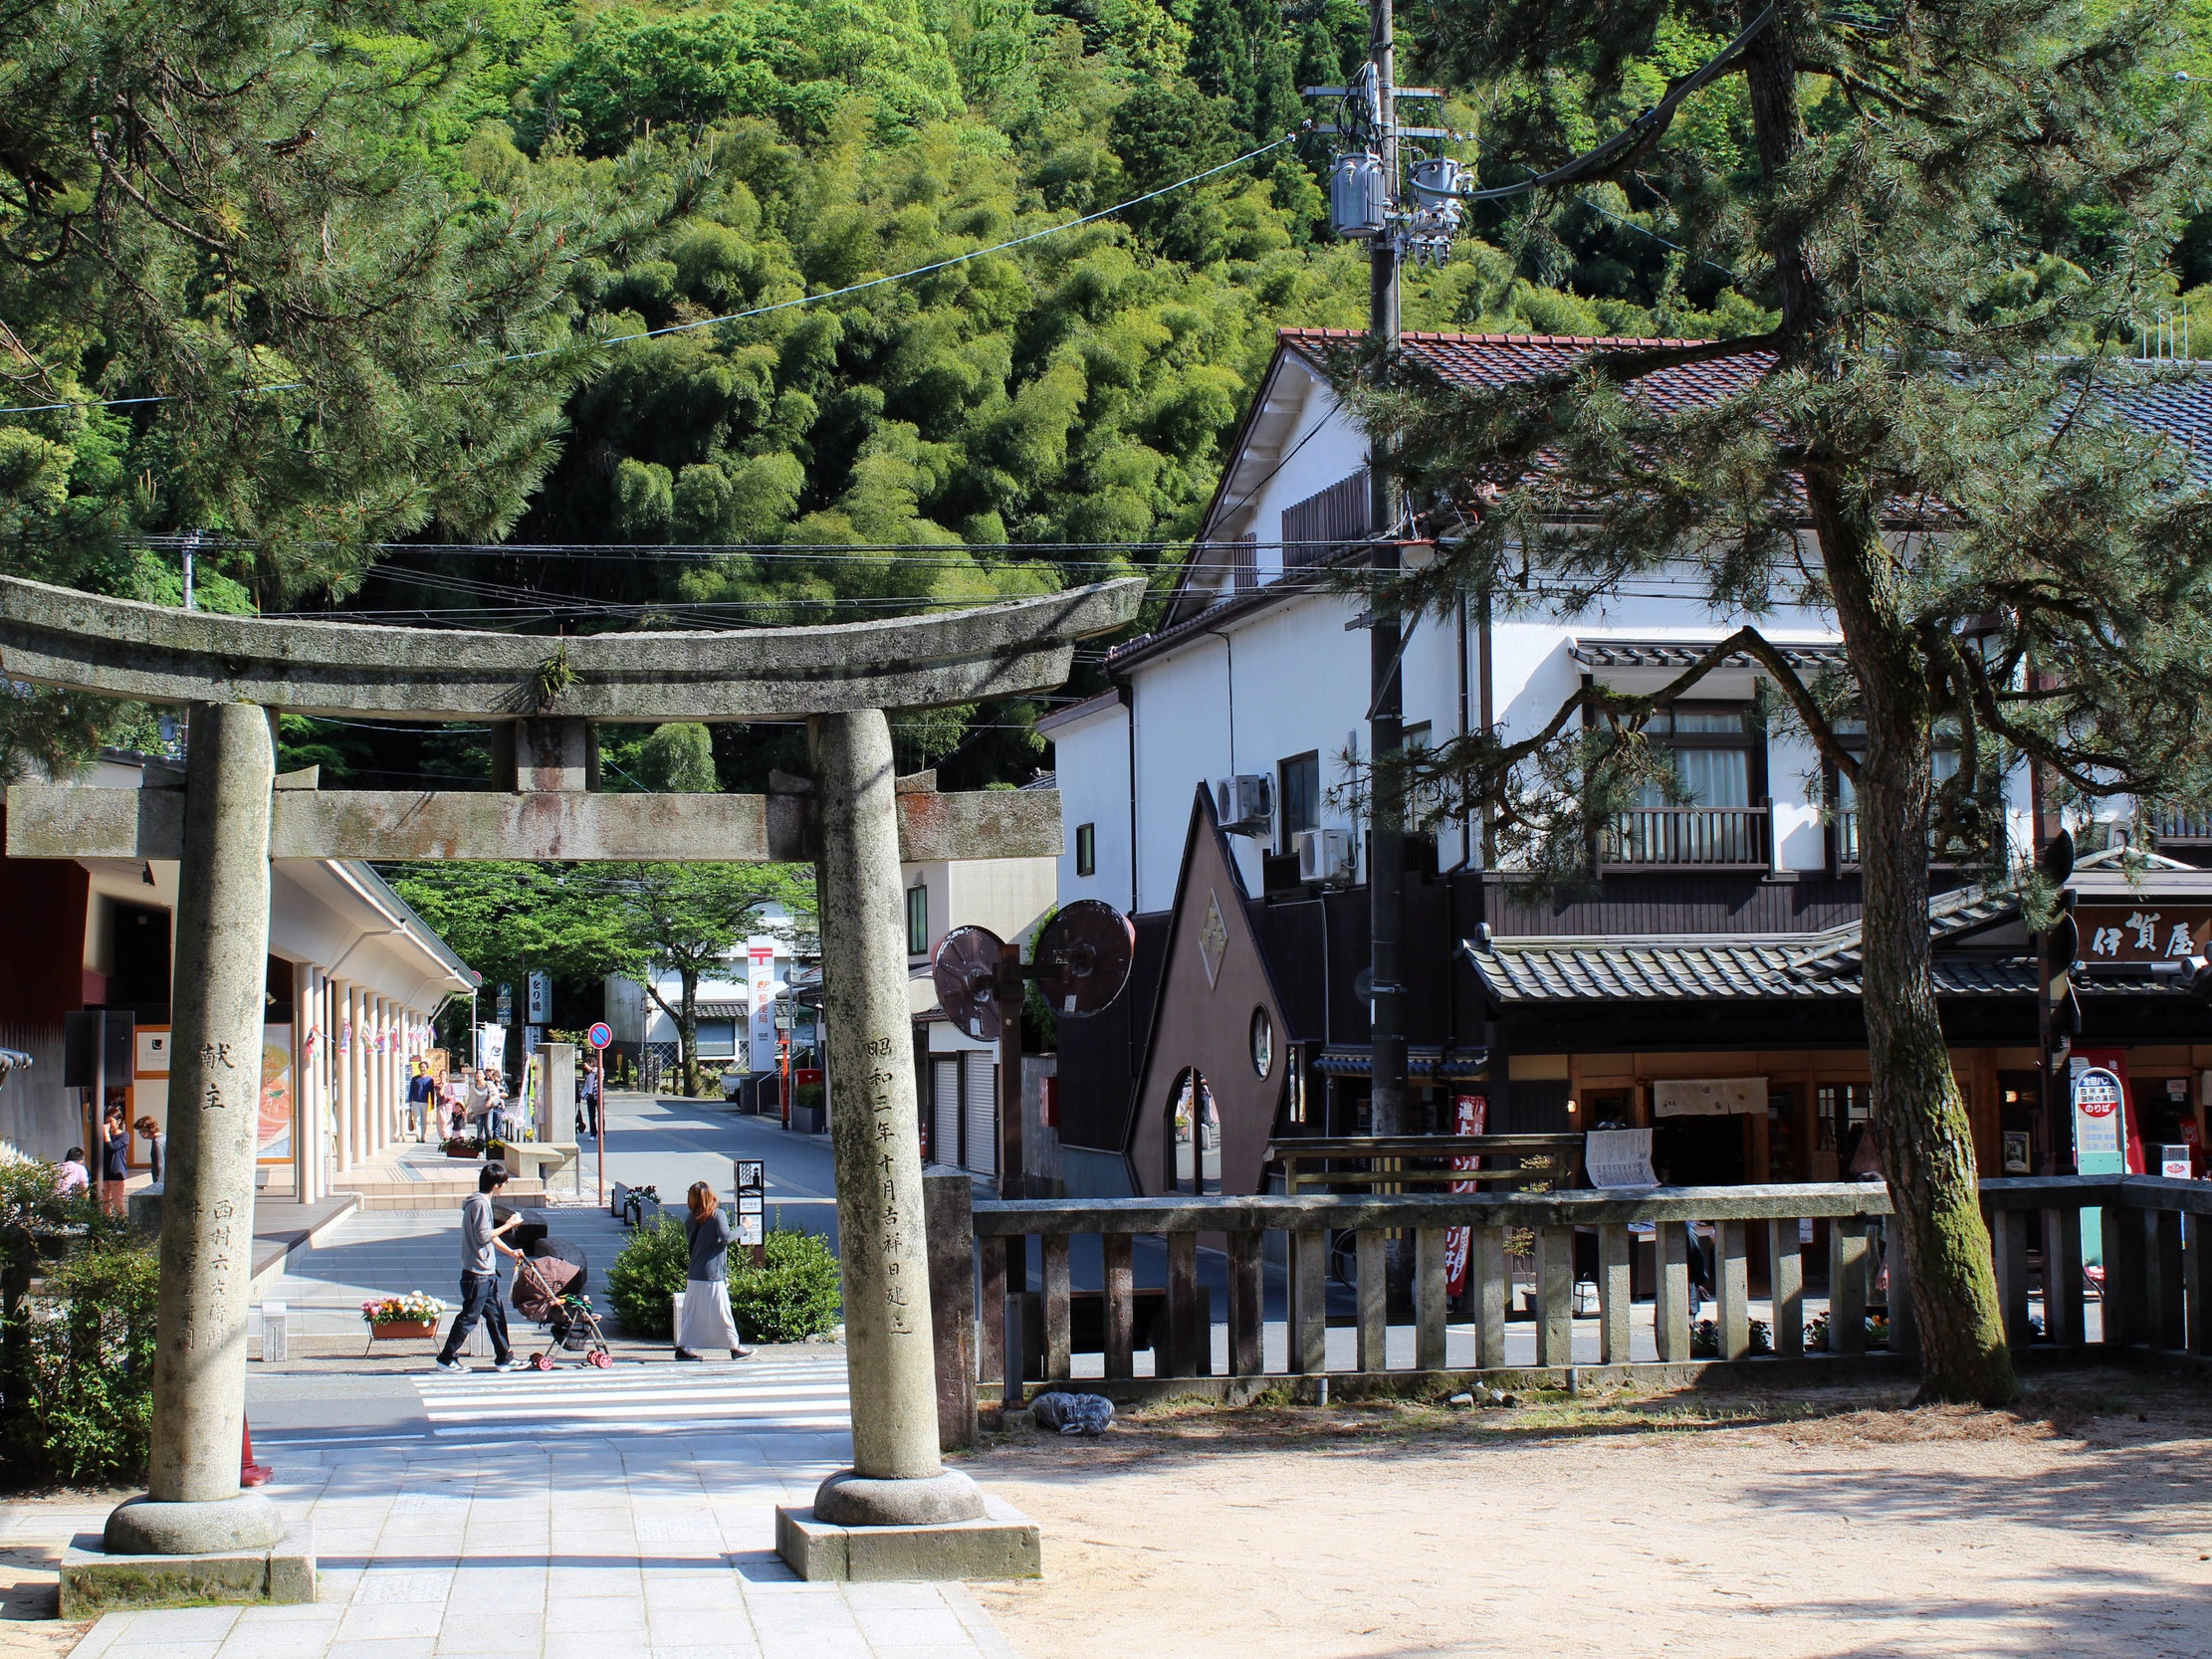 The streets of Kinosaki, Japan